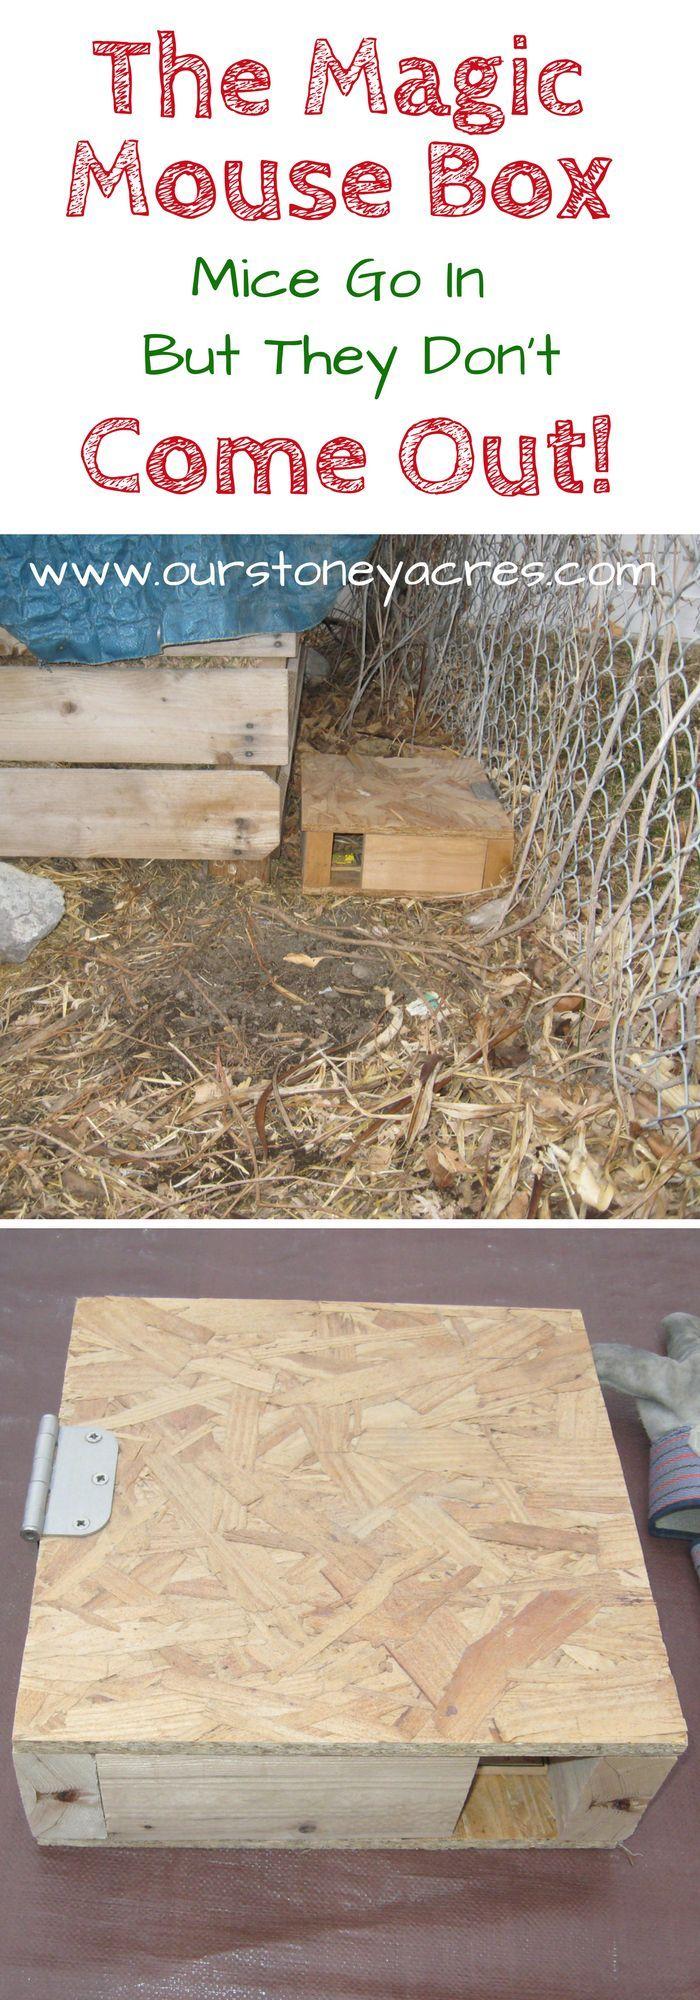 ae0aaef9d5677badf348b4e6b3cfacca - How To Get Rid Of Mice In Compost Bin